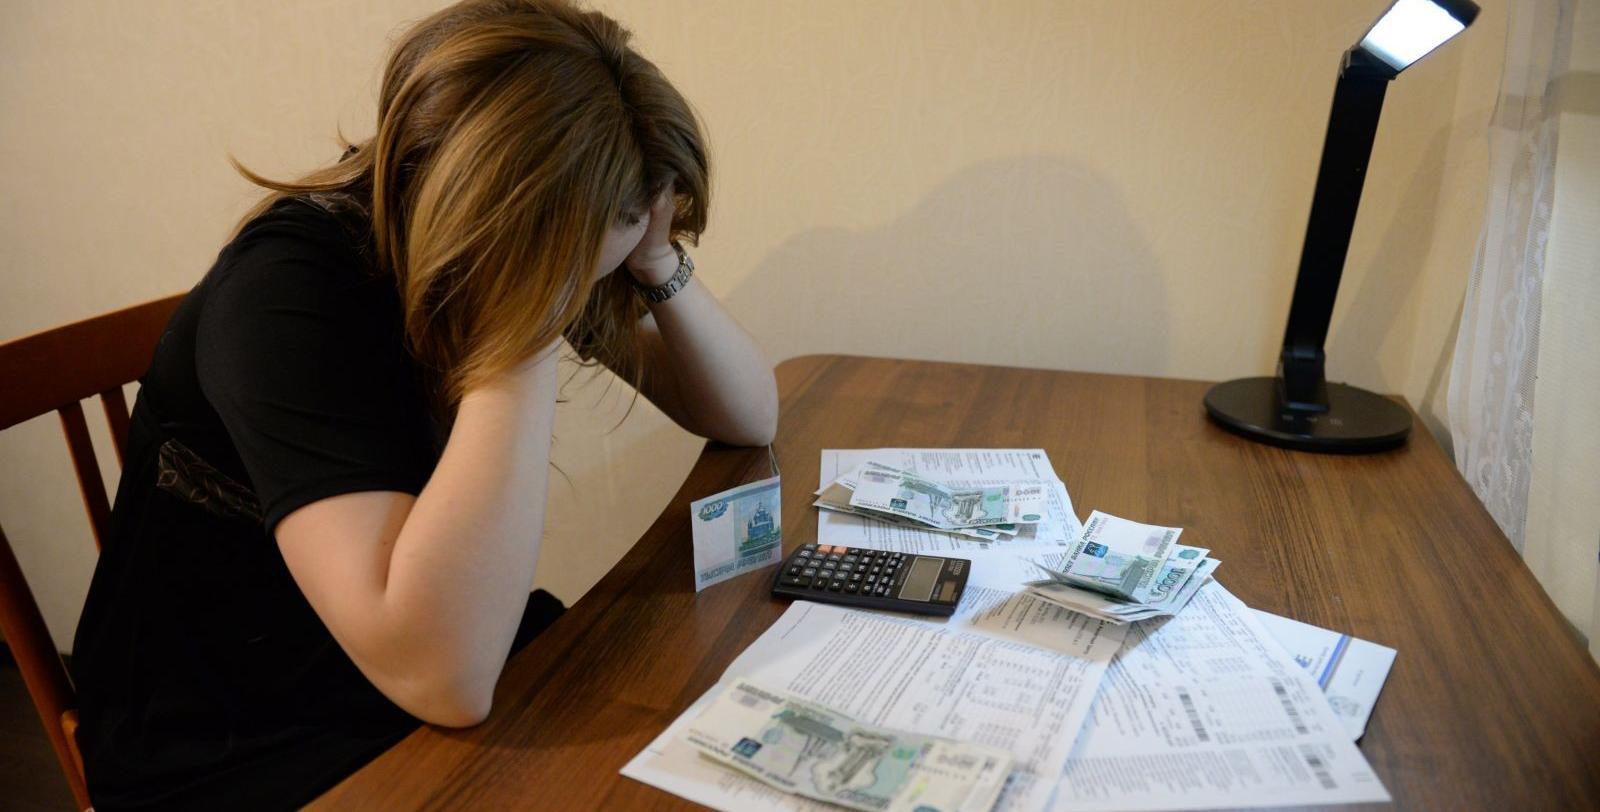 консультация юриста по банковским делам